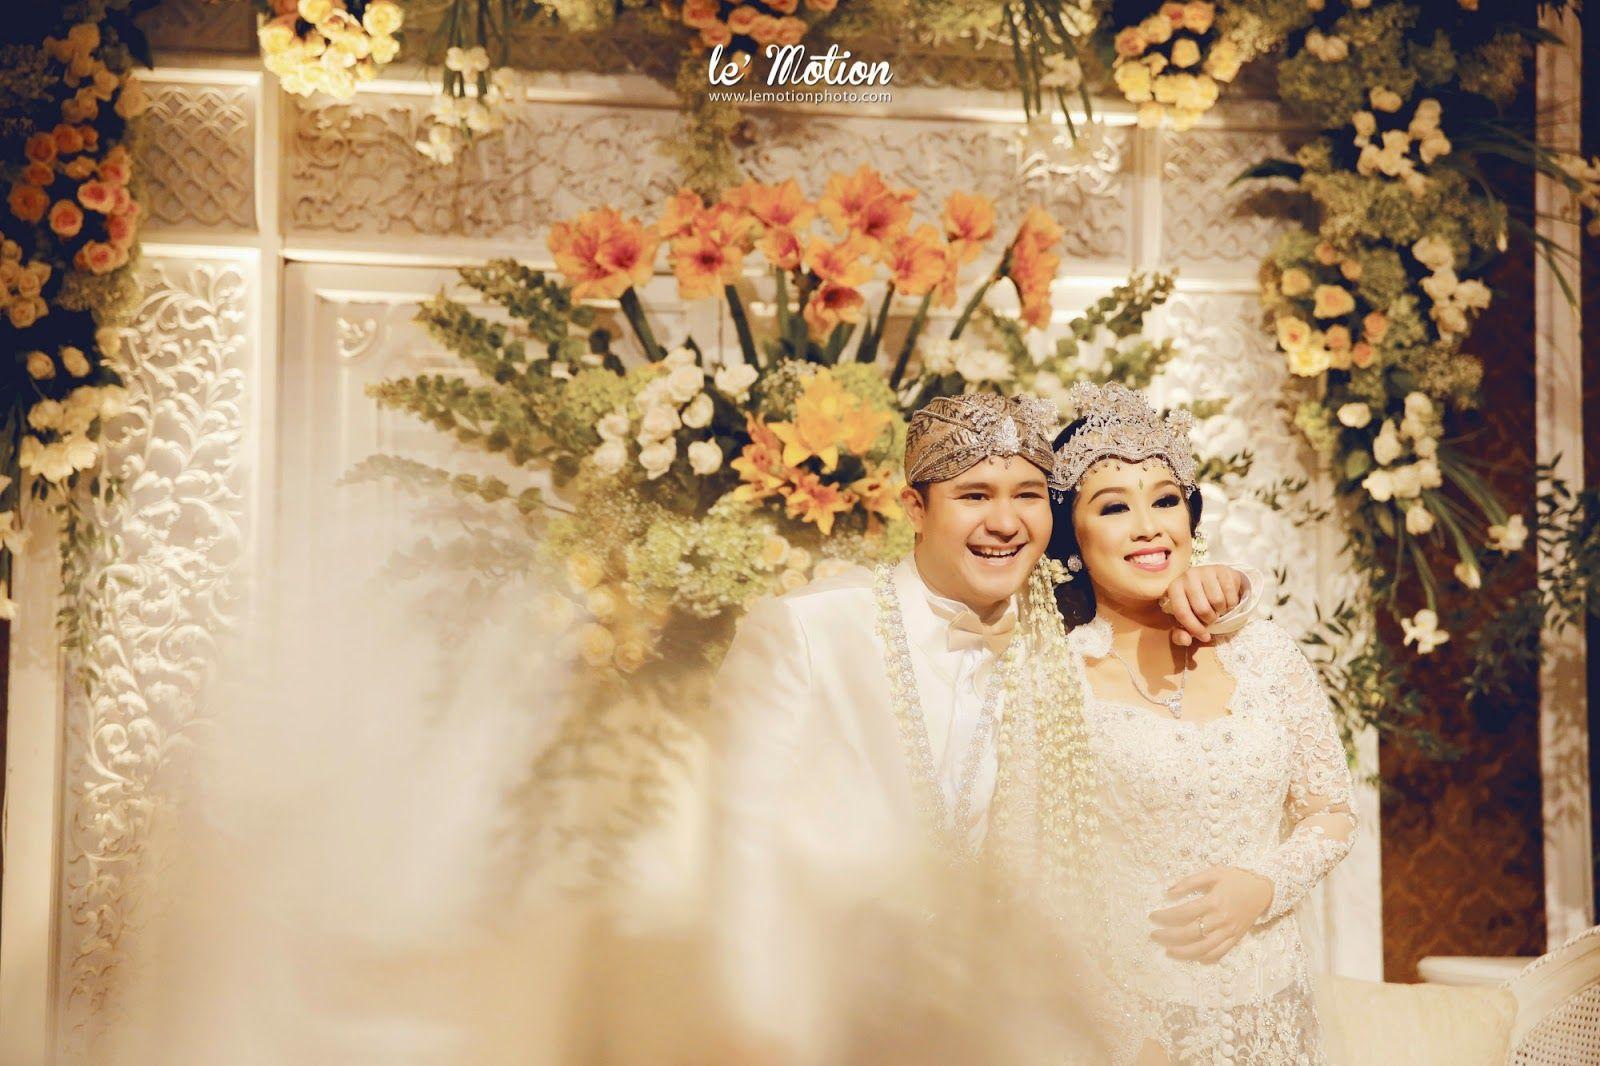 Le Motion Photo Melisa Rizky Wedding